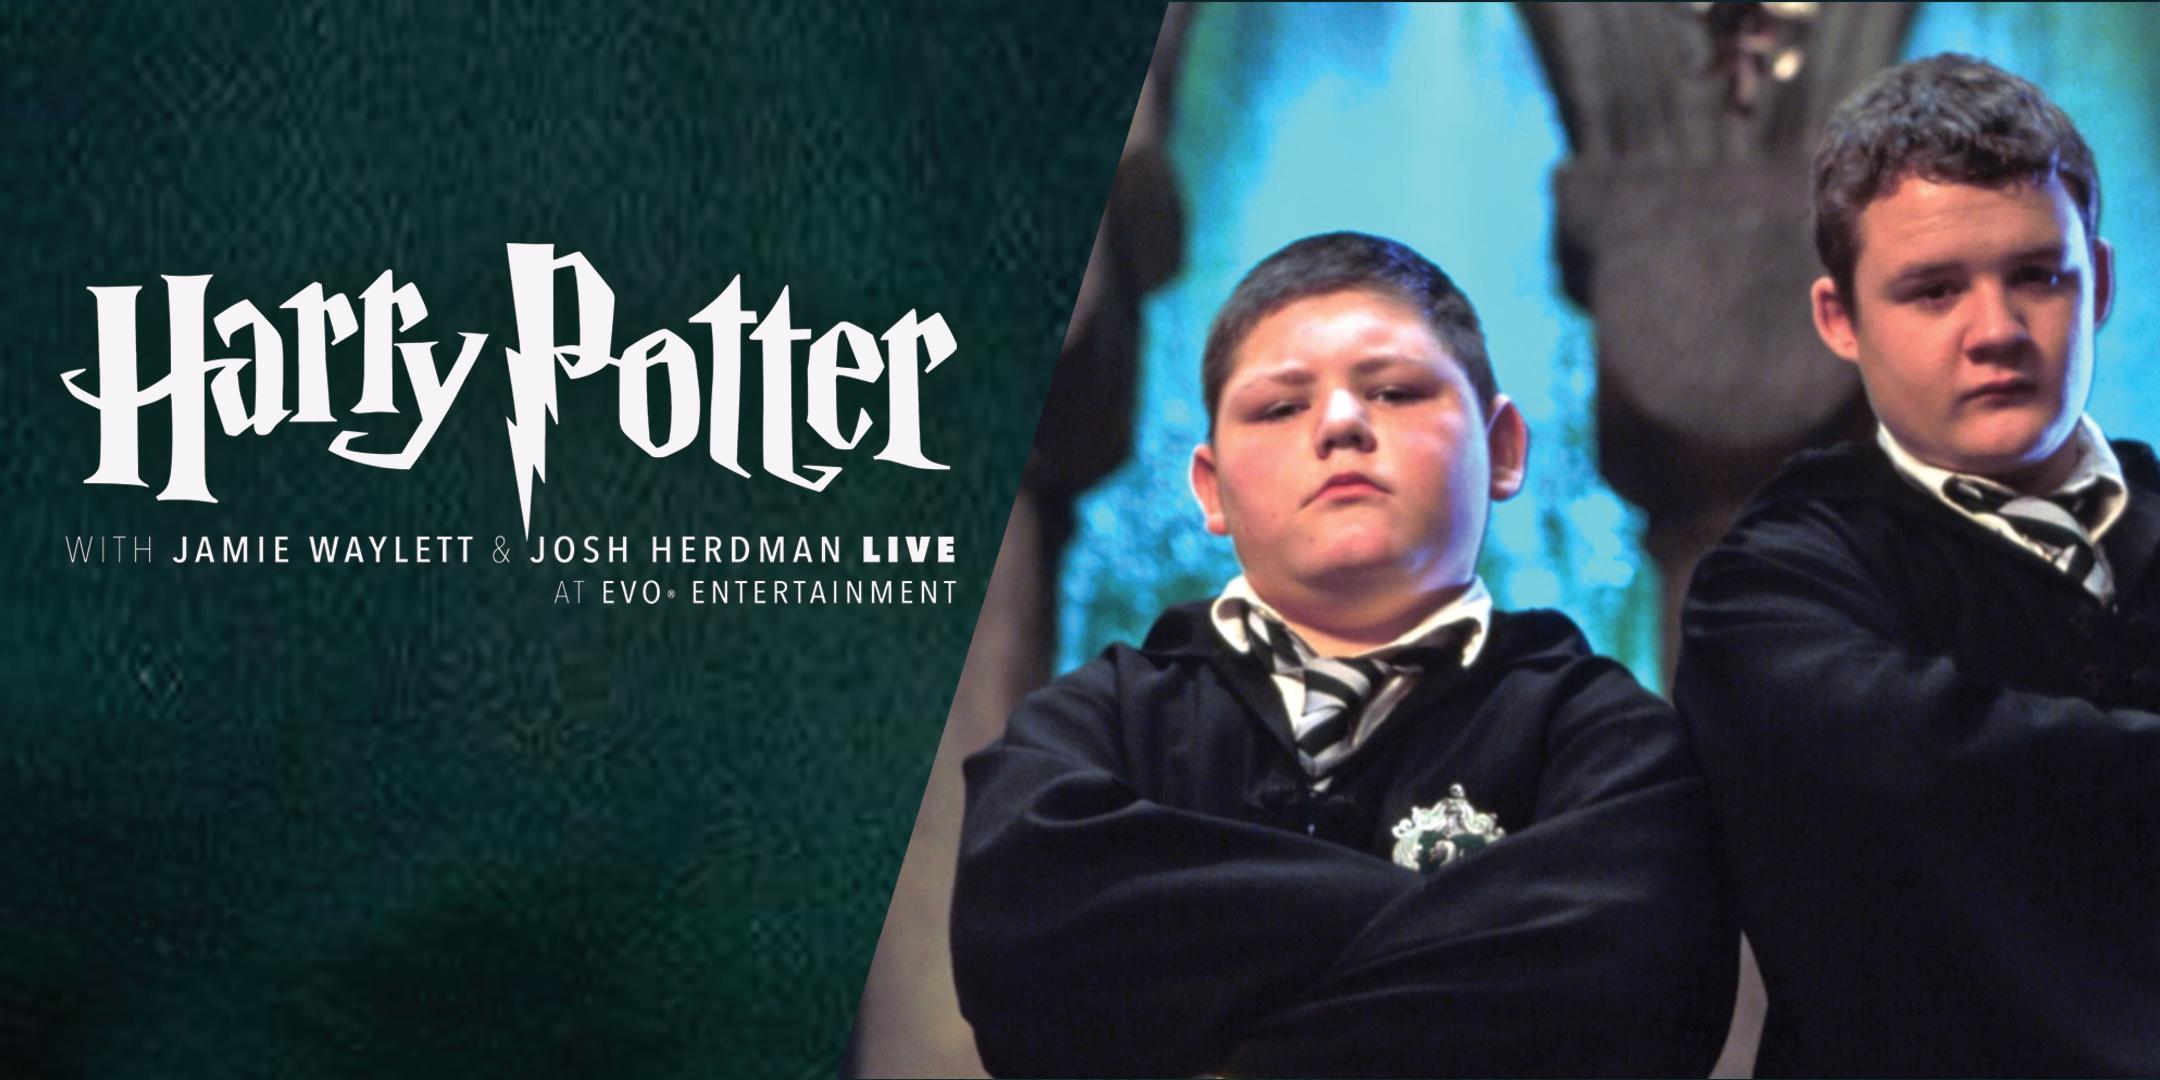 Harry Potter Live With Jamie Waylett Josh Herdman Schertz Tx 28 Mar 2020 Herdman defeated his polish opponent janusz walachowski at the city pavillion in london, reported daily mirror. harry potter live with jamie waylett